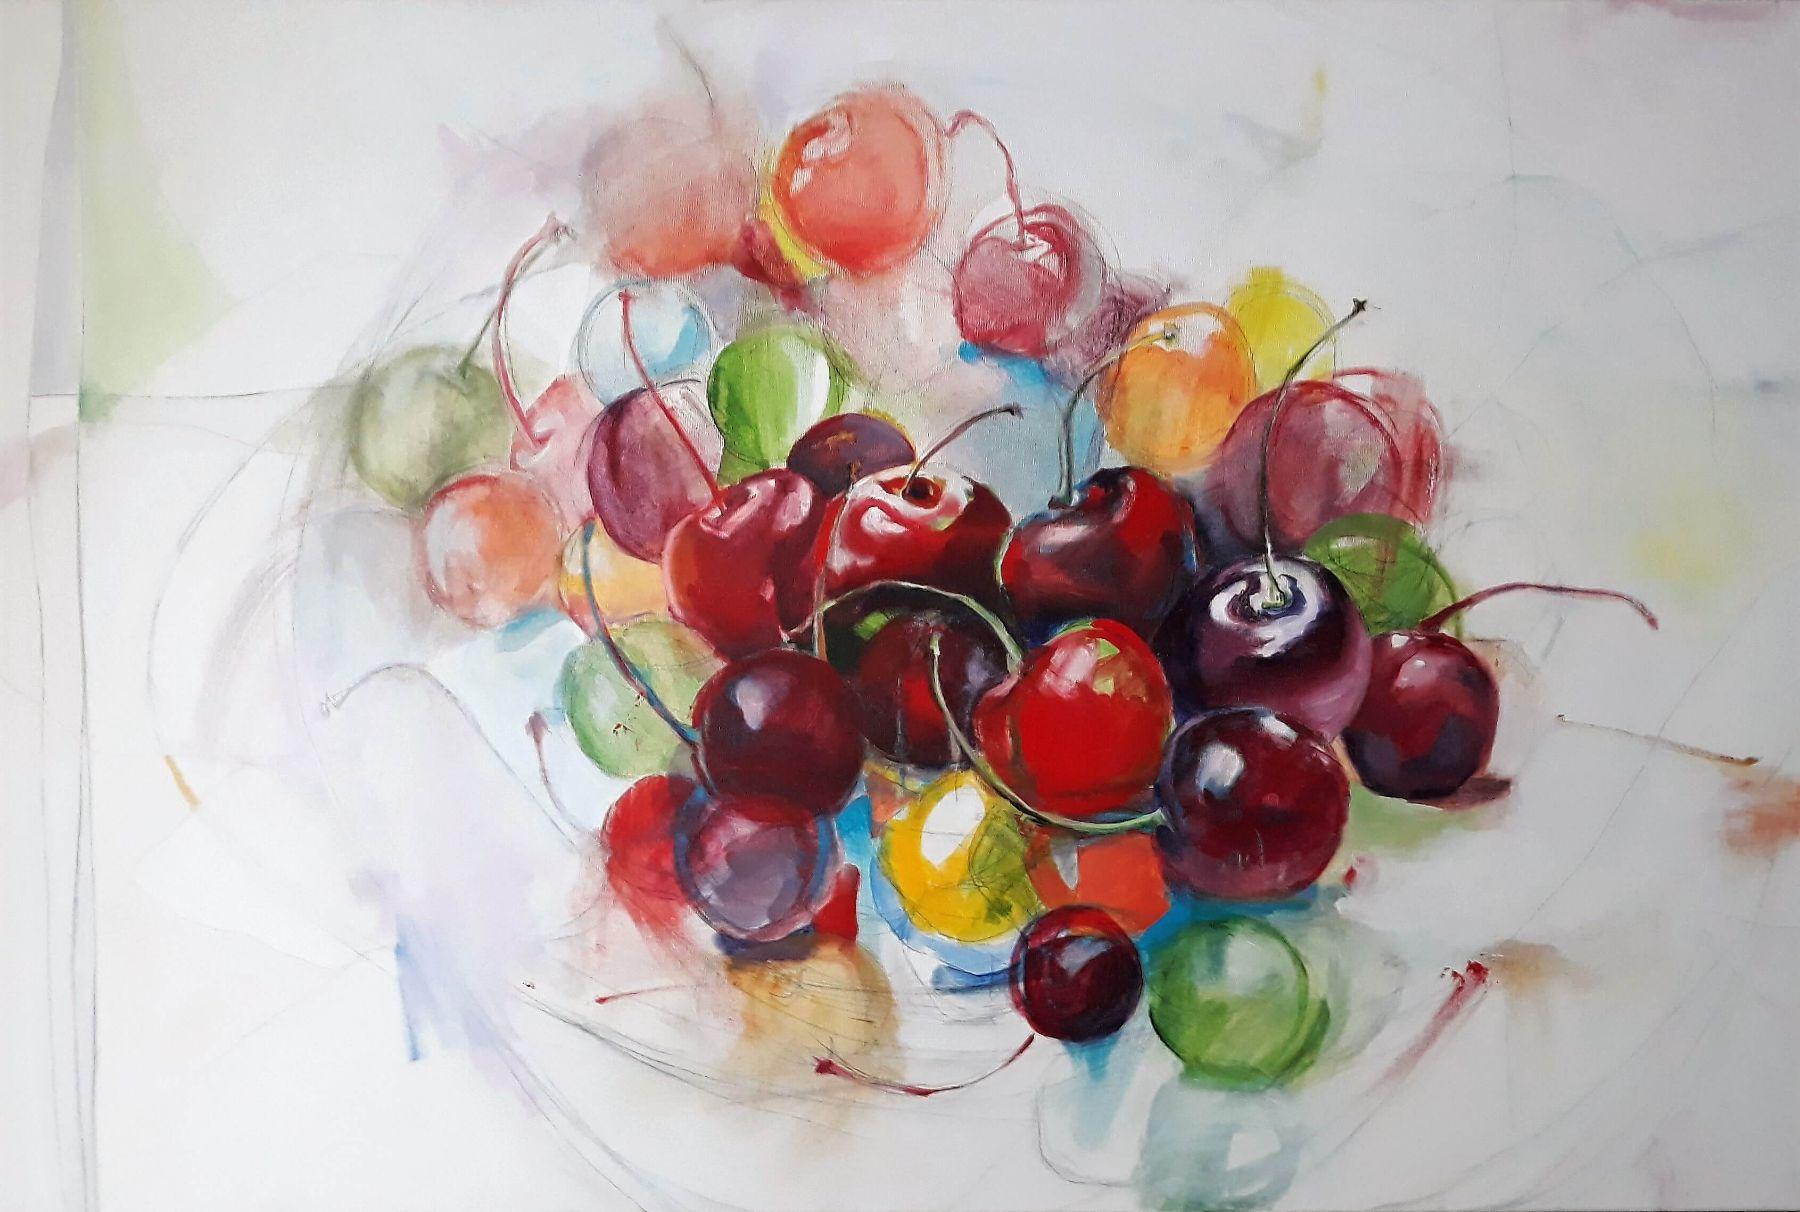 Cherry Bouquet - painting, acrylic on canvas by artist Neva Bergemann